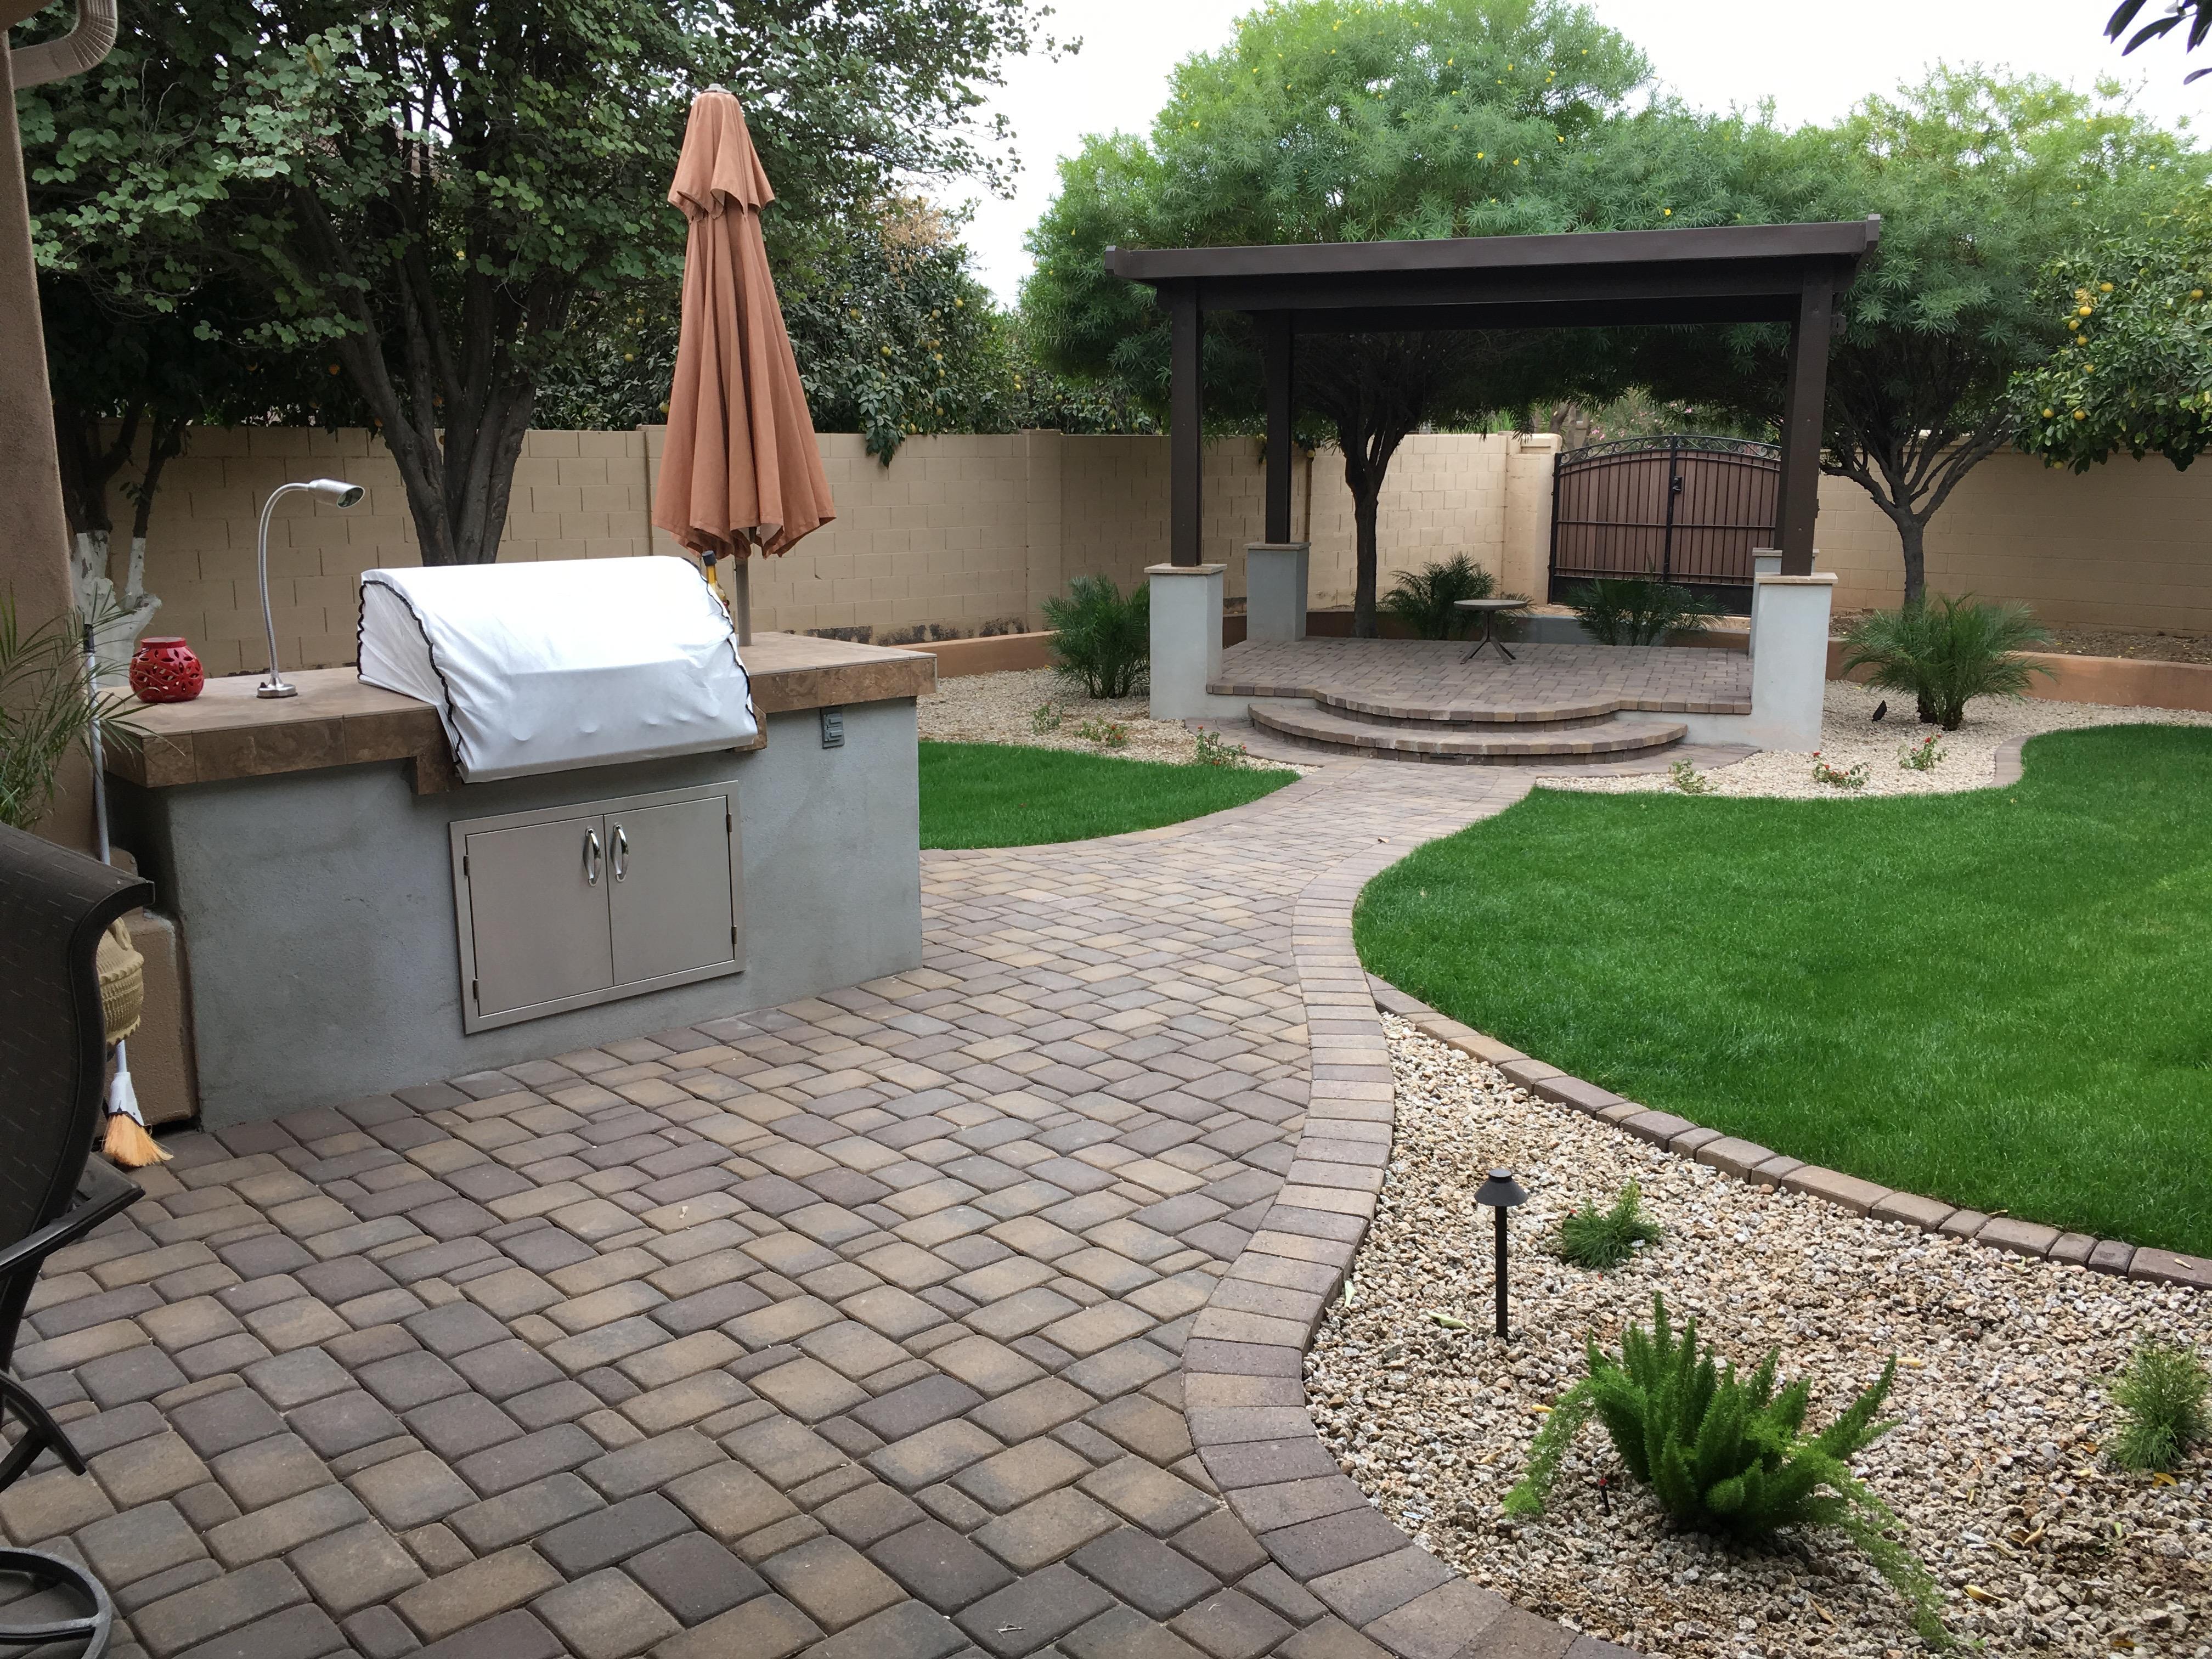 Poolside Plants For Arizona Landscape Design on Landscape Design Small Area id=11812